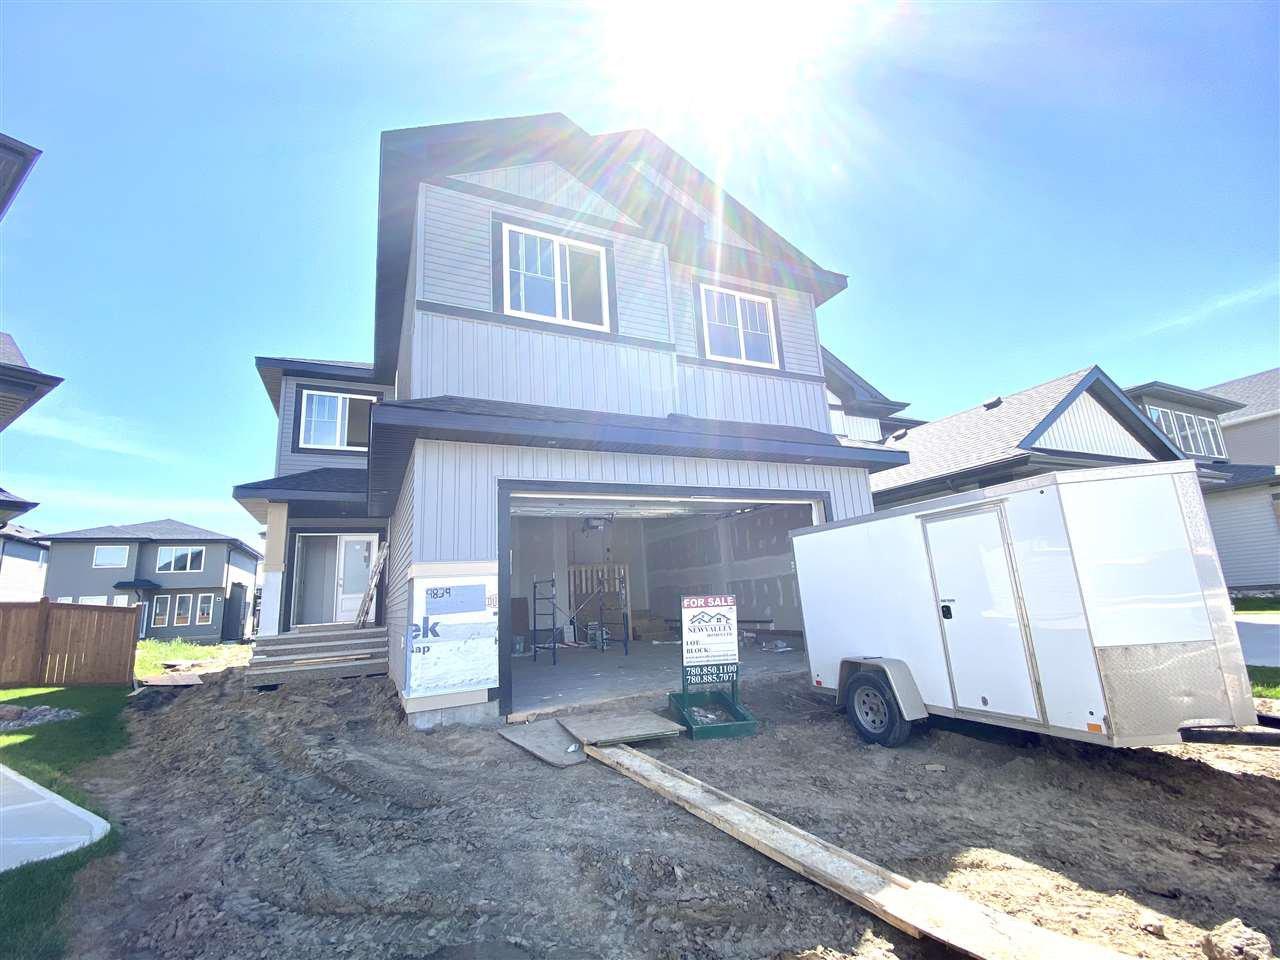 Main Photo: 9839 225 Street in Edmonton: Zone 58 House for sale : MLS®# E4202483